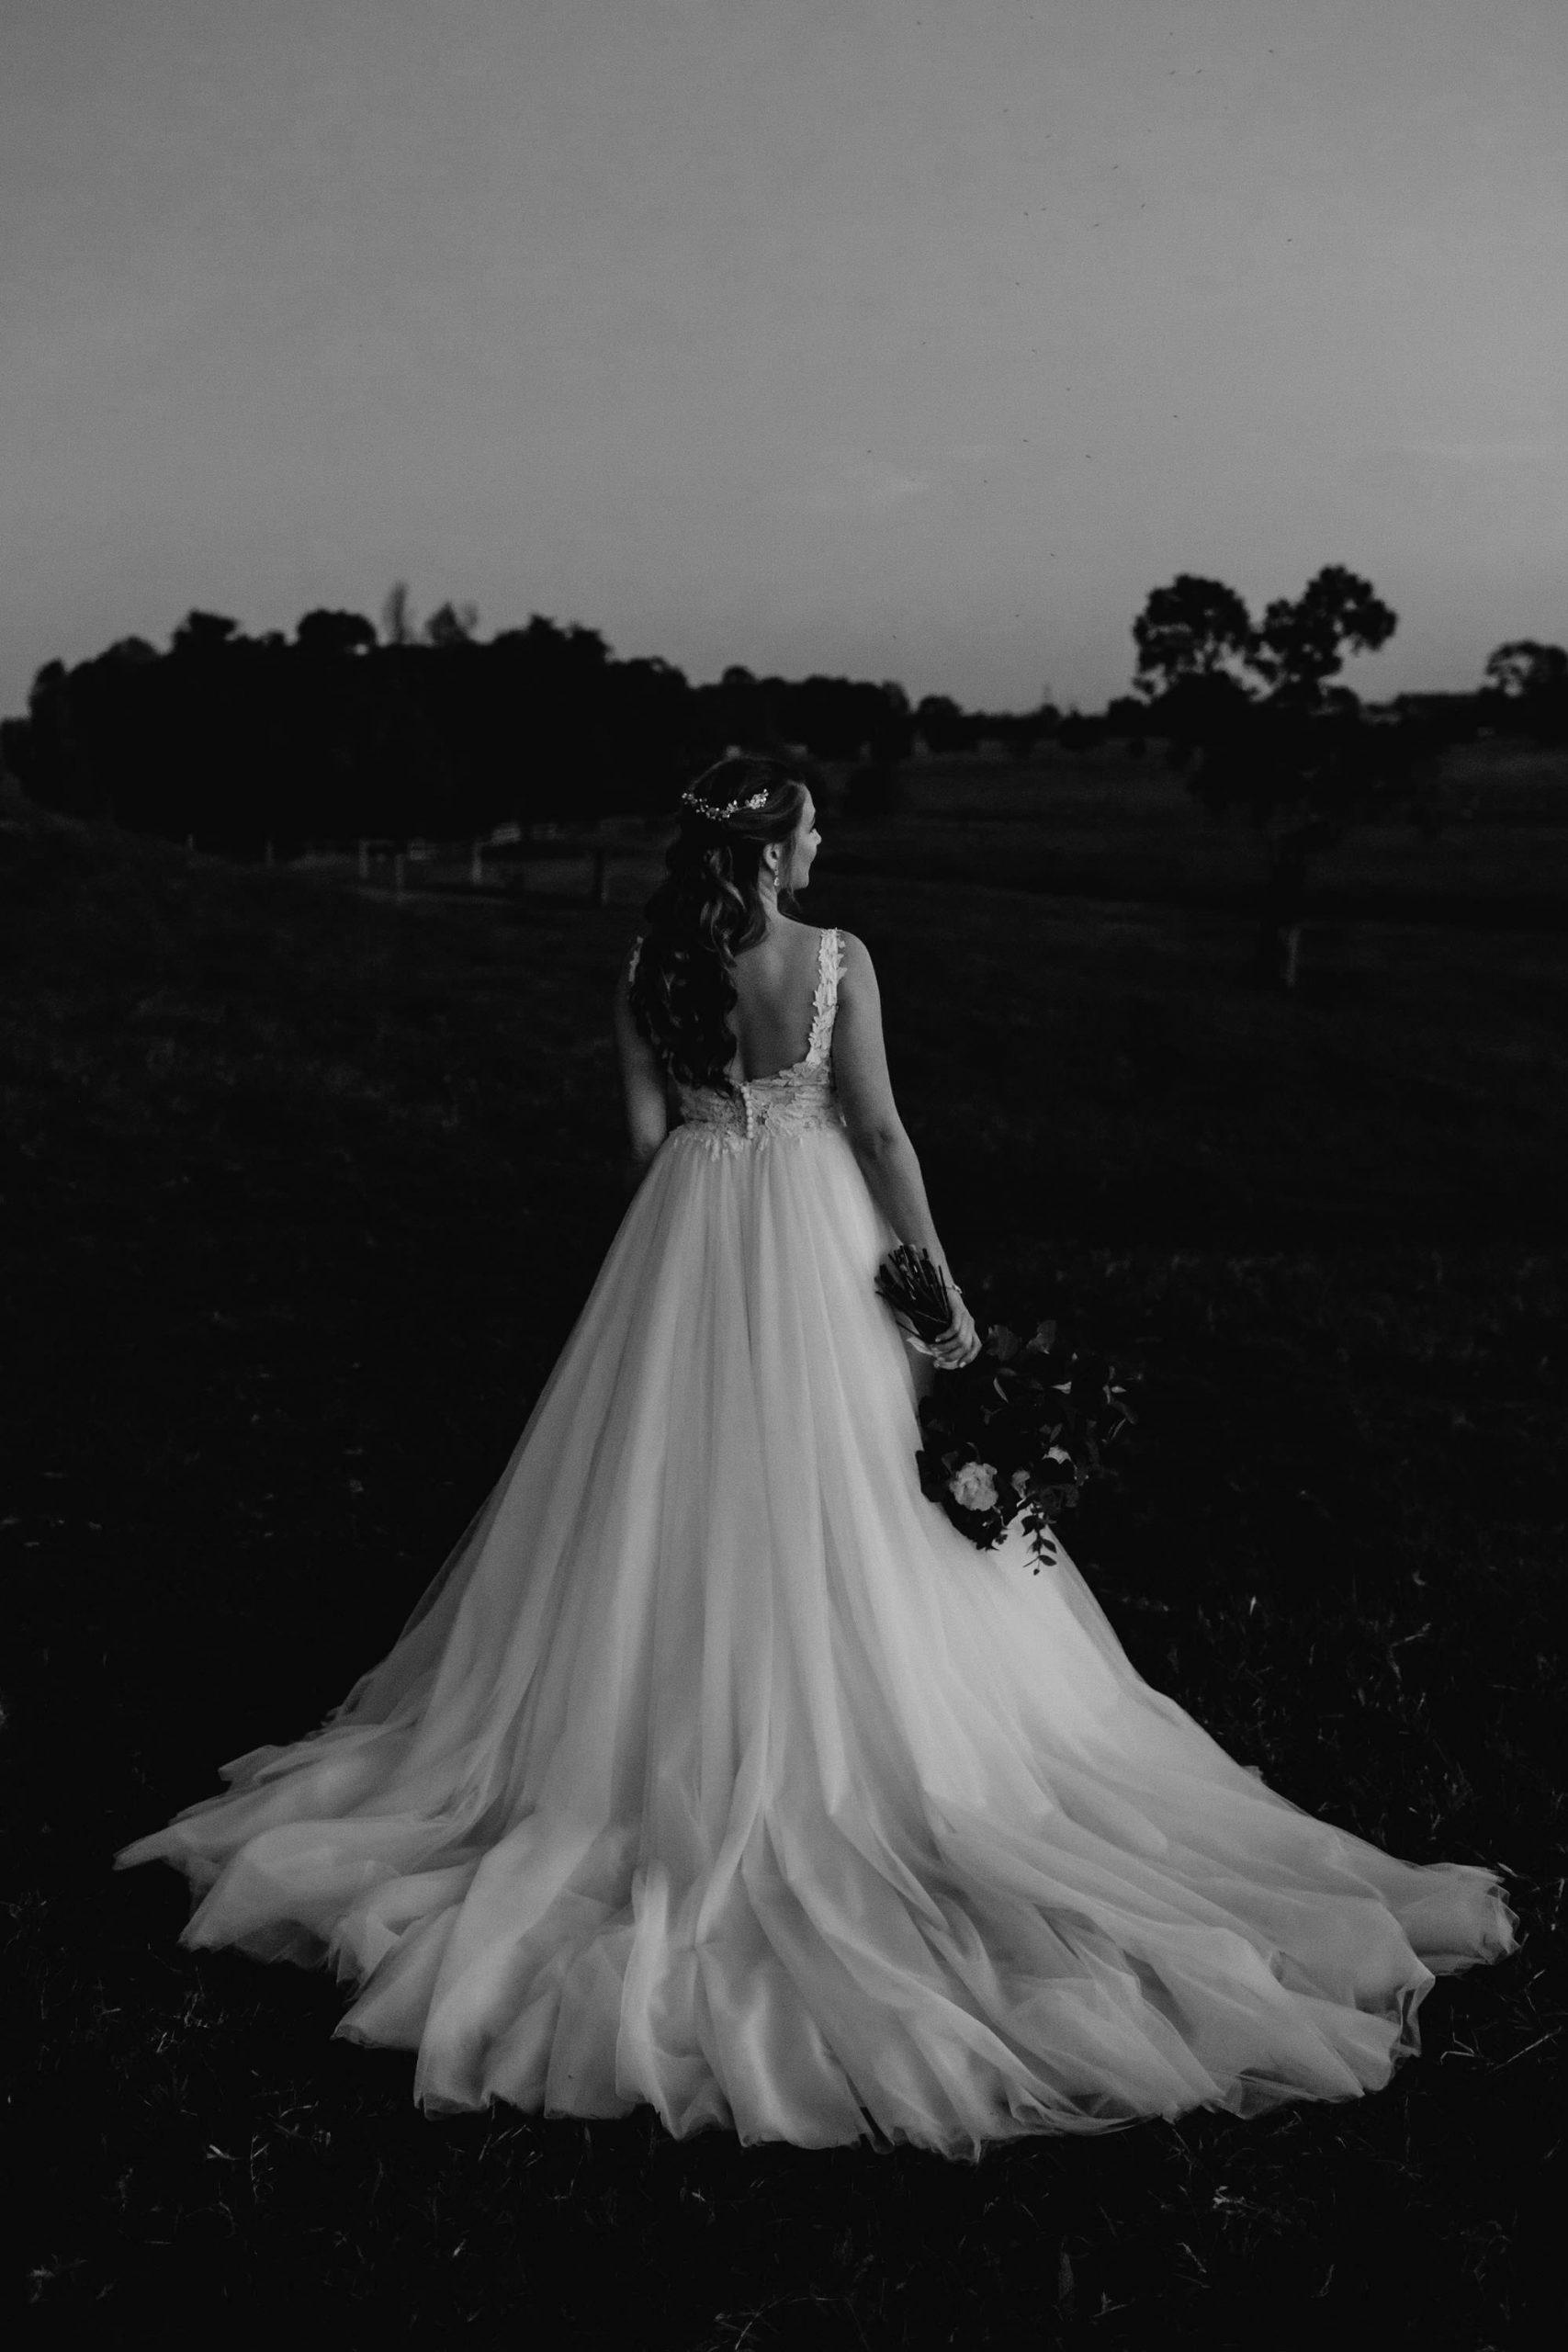 Bride at sunset